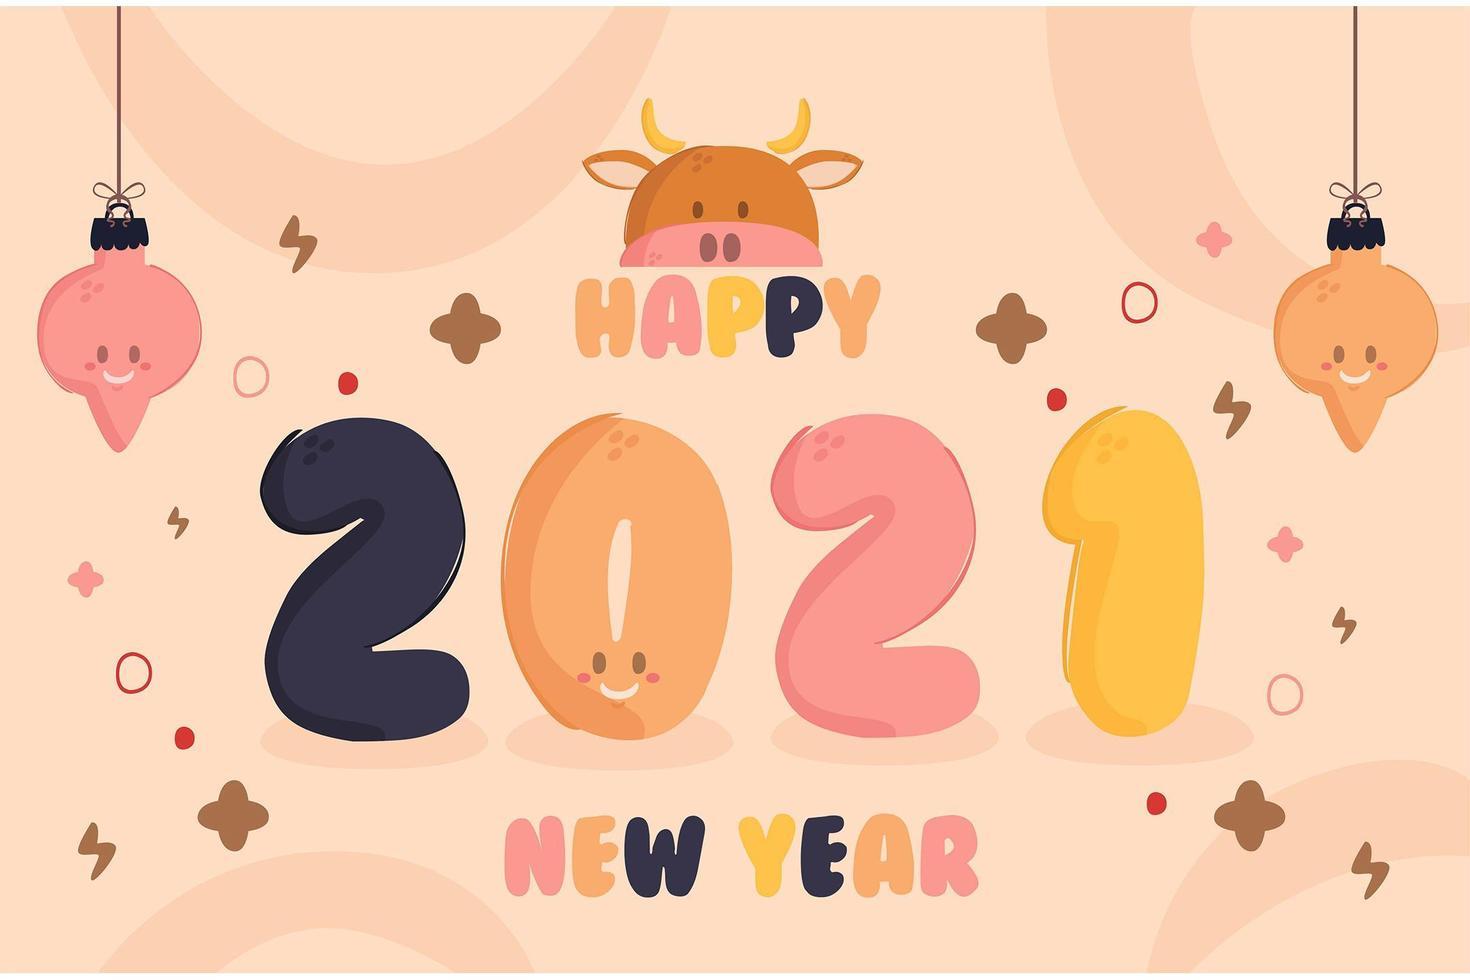 2021 New Year Background Design vector